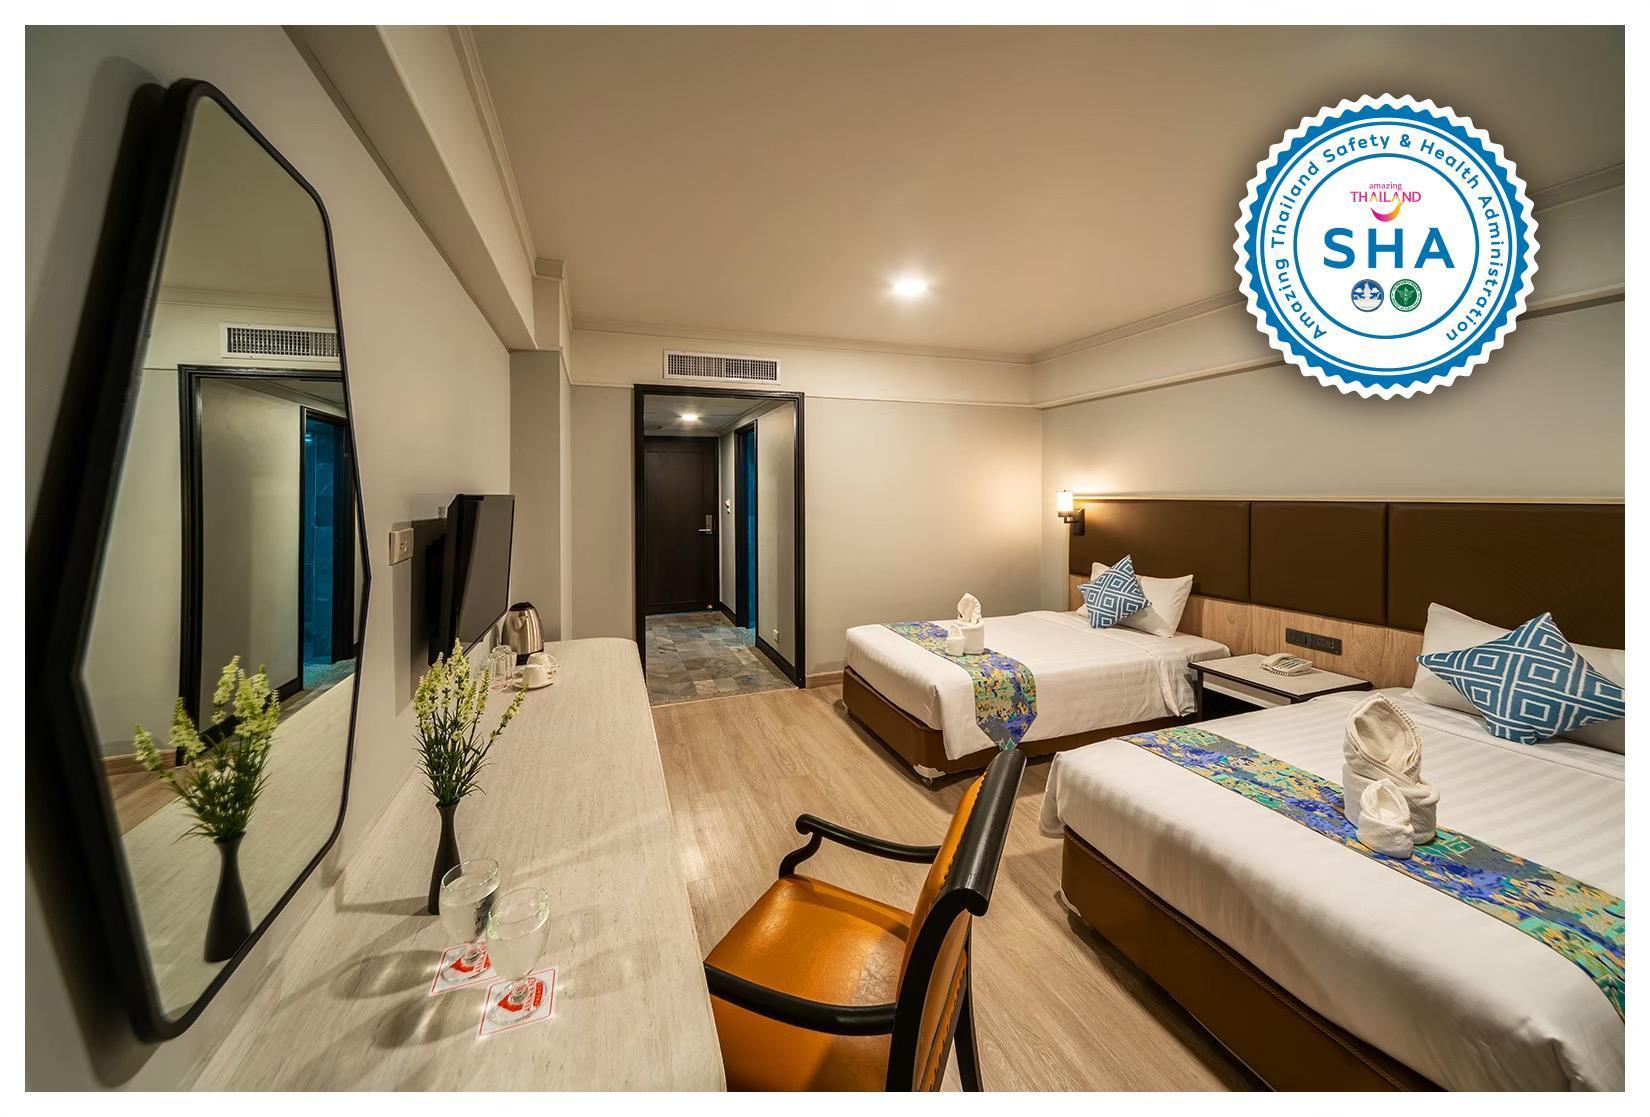 Karnmanee Palace Hotel (SHA Certified)